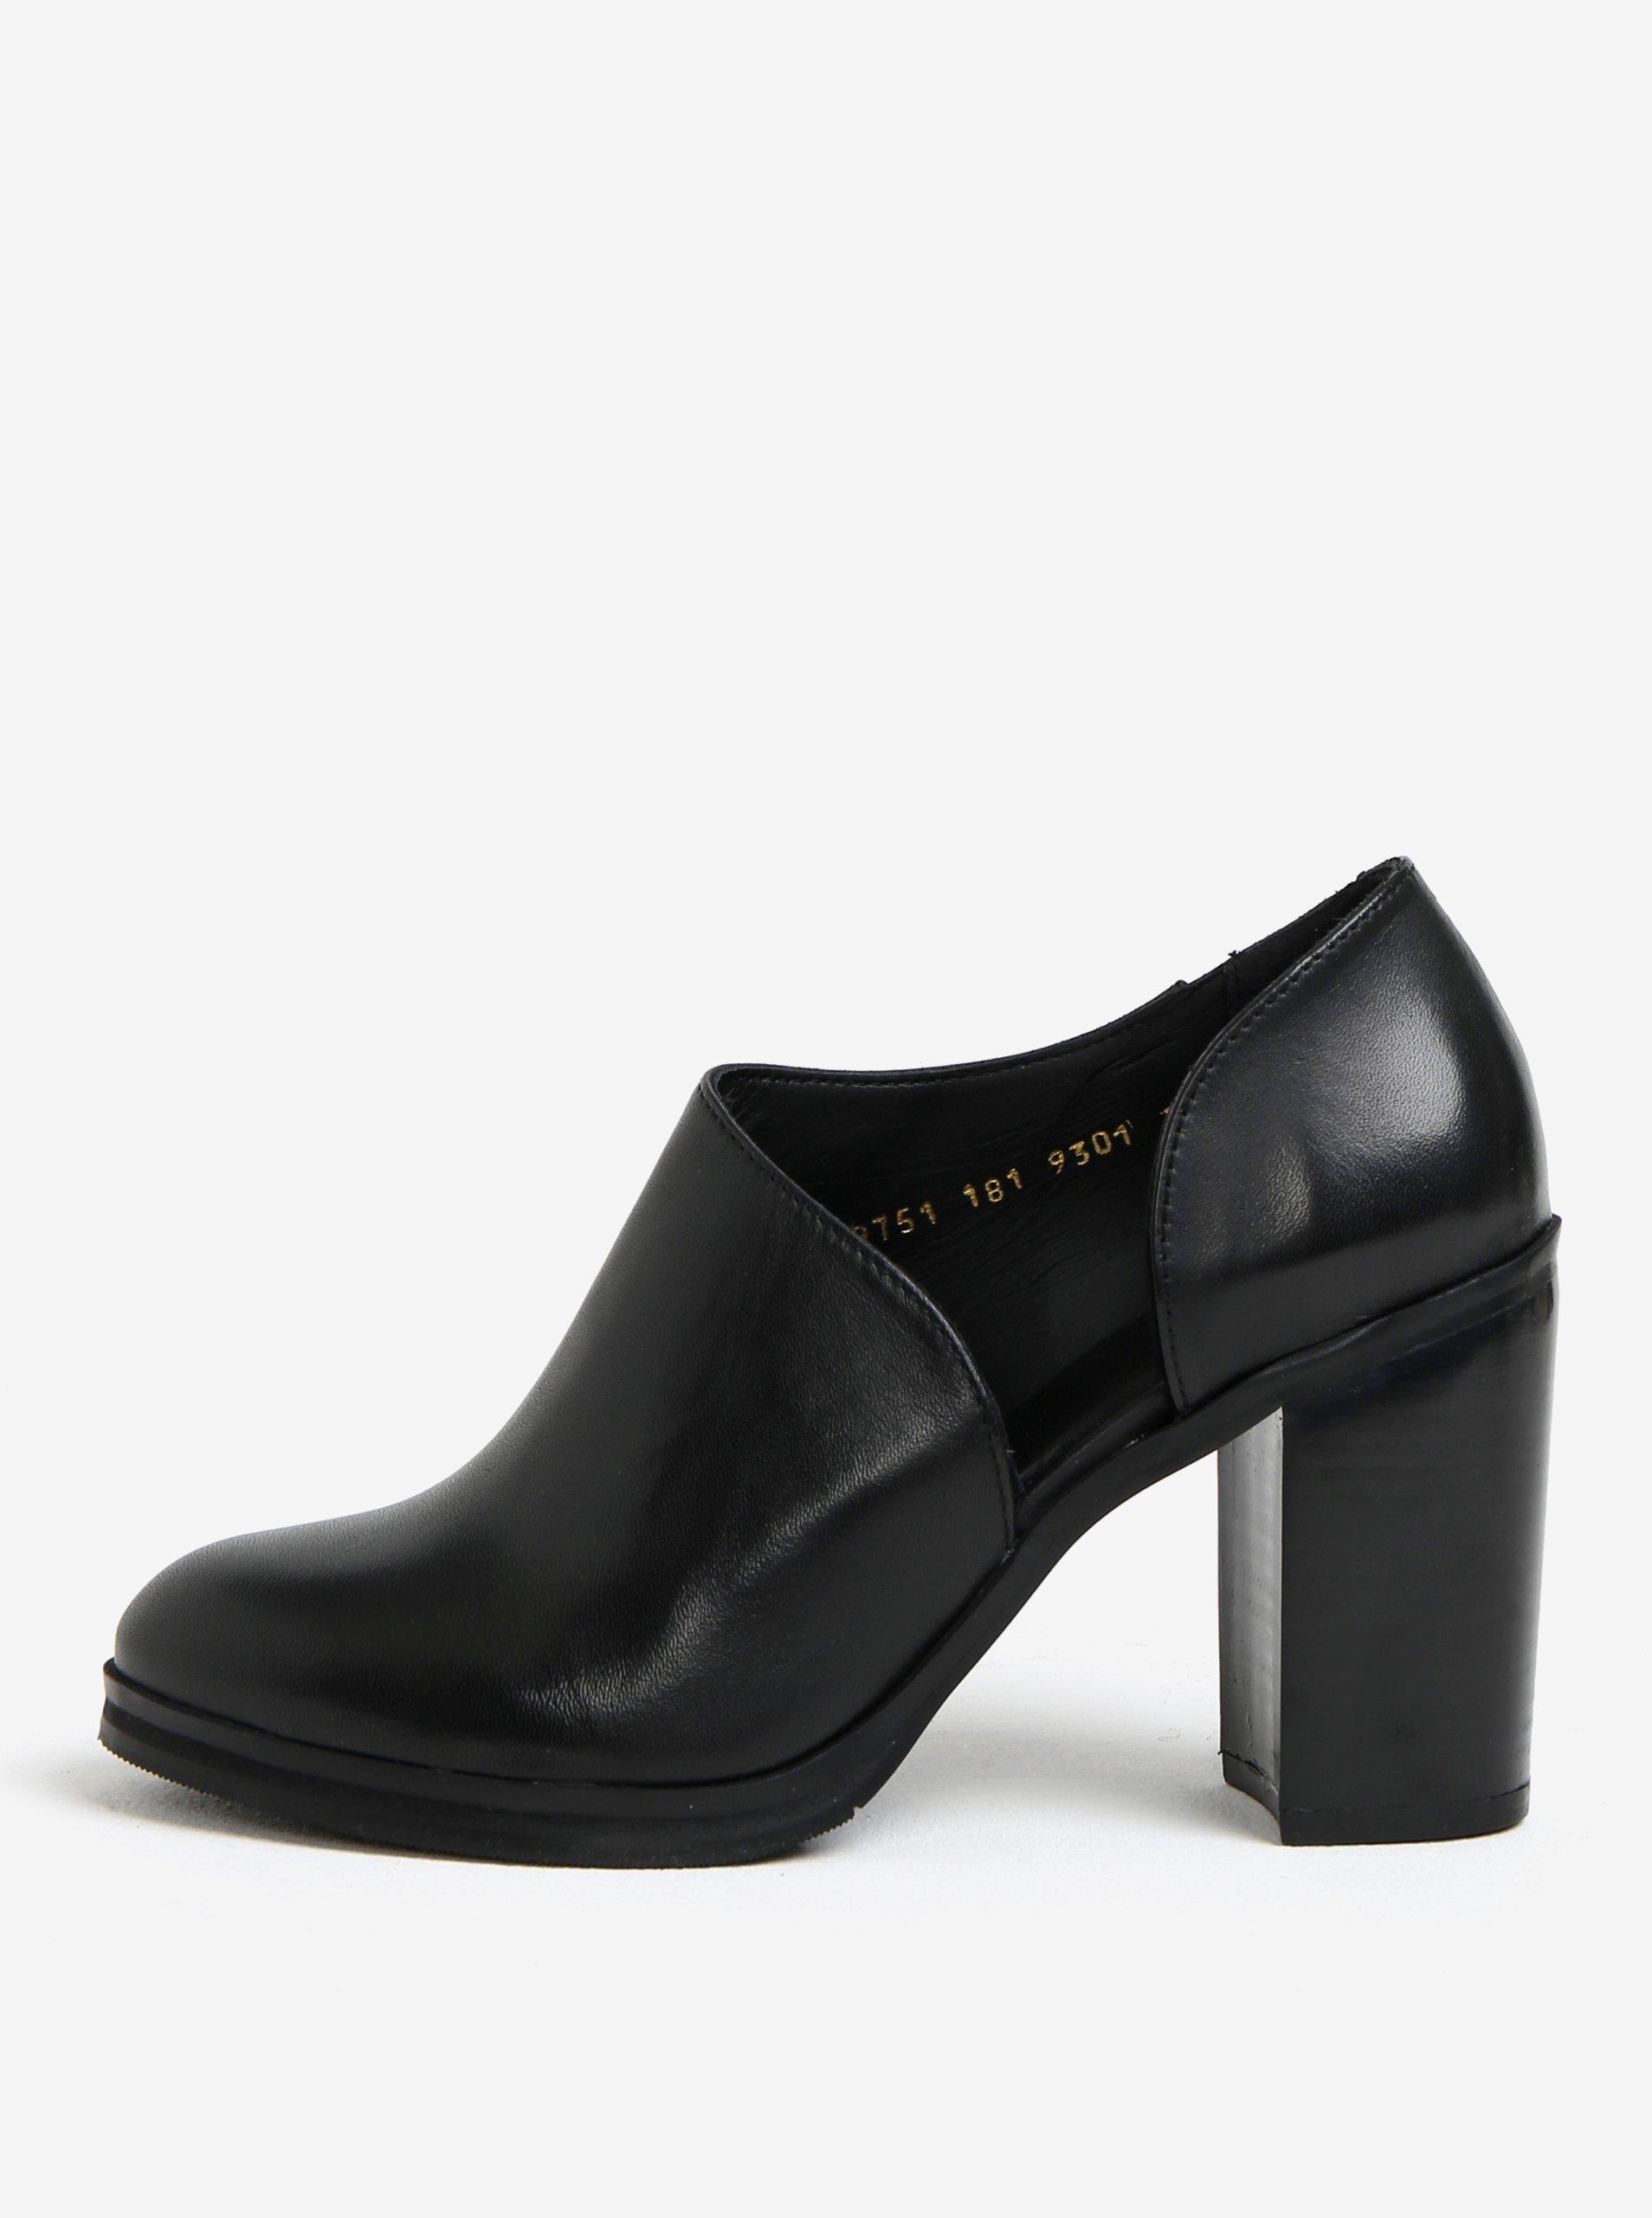 9ce0820c44de6 Čierne dámske kožené topánky na vysokom podpätku Royal RepubliQ ...